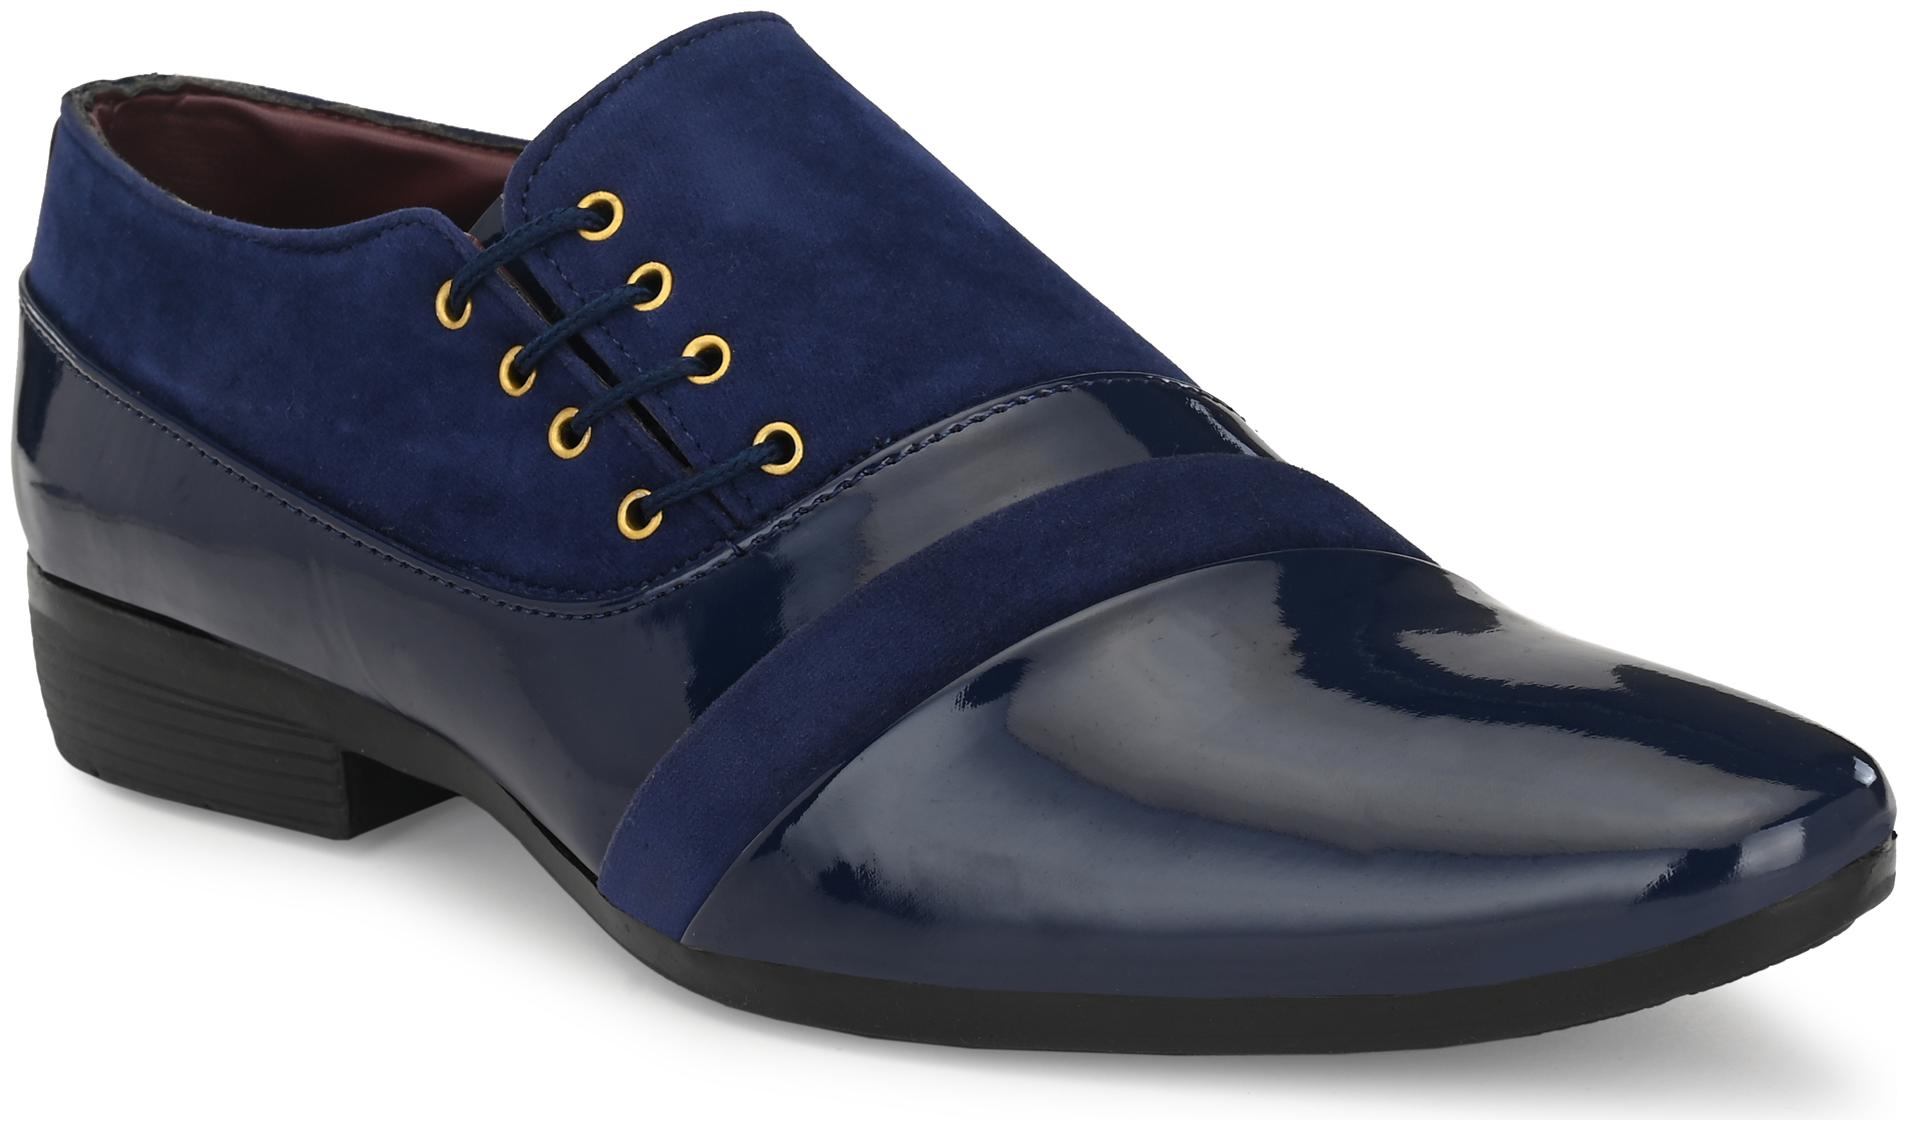 Afreet Monk Party Wear Shoes Beige 6